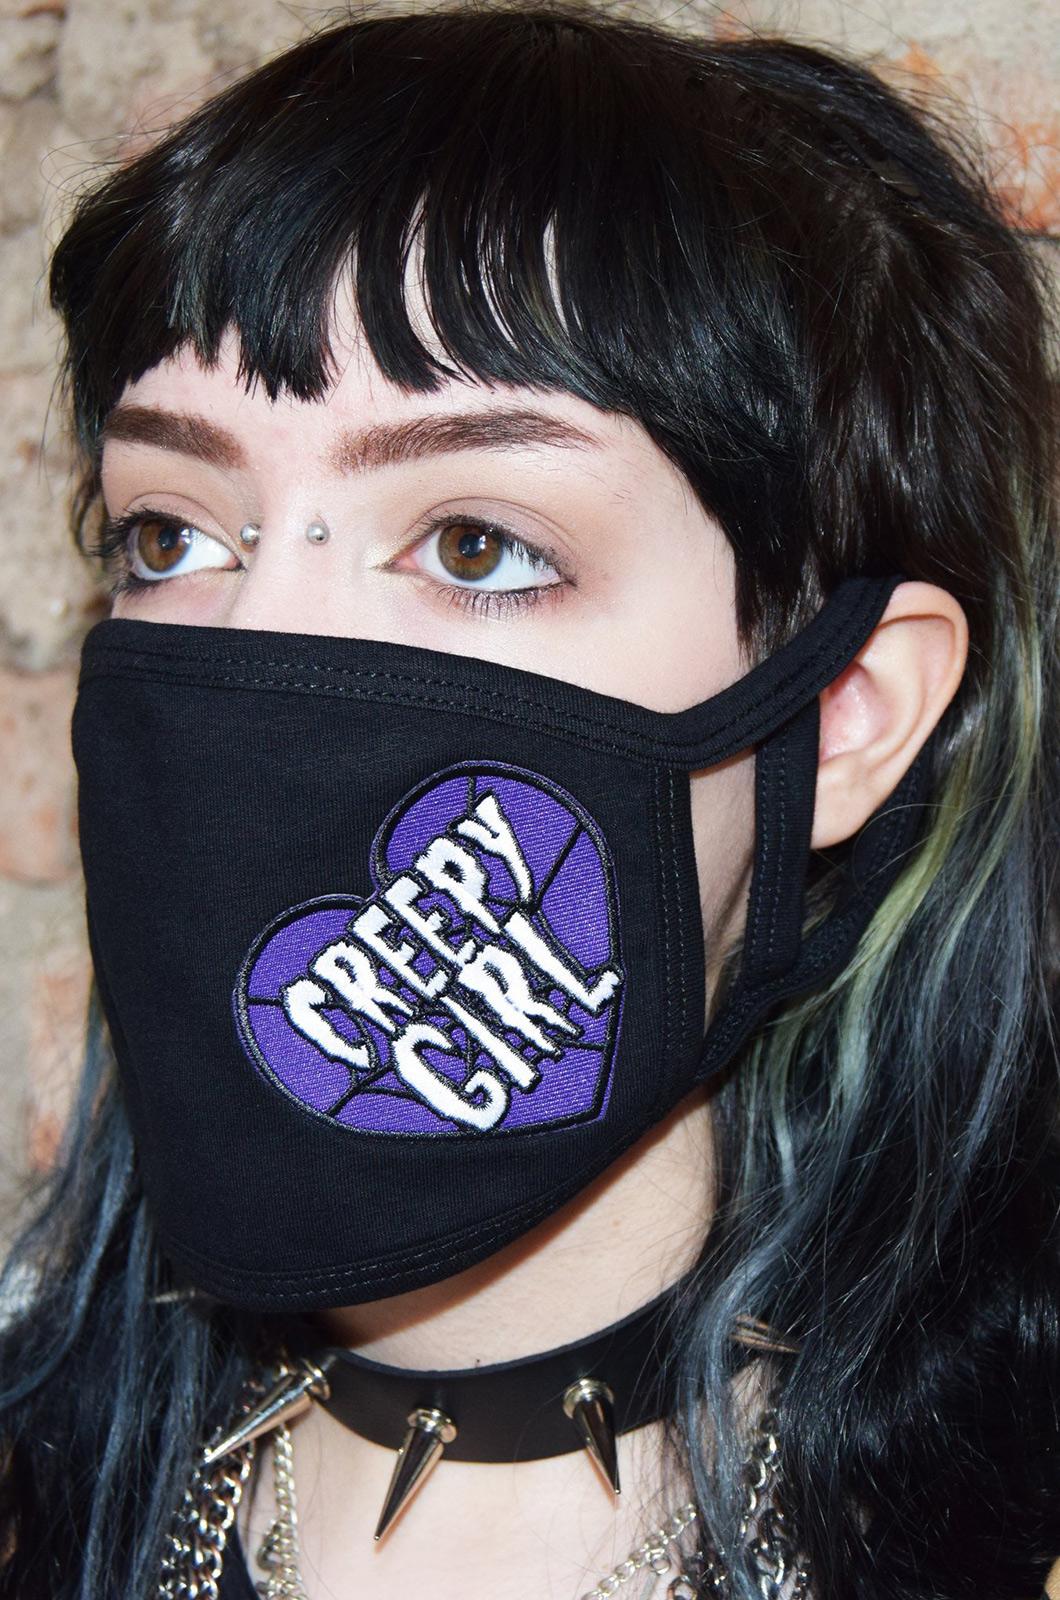 Creepy Girl Face Mask